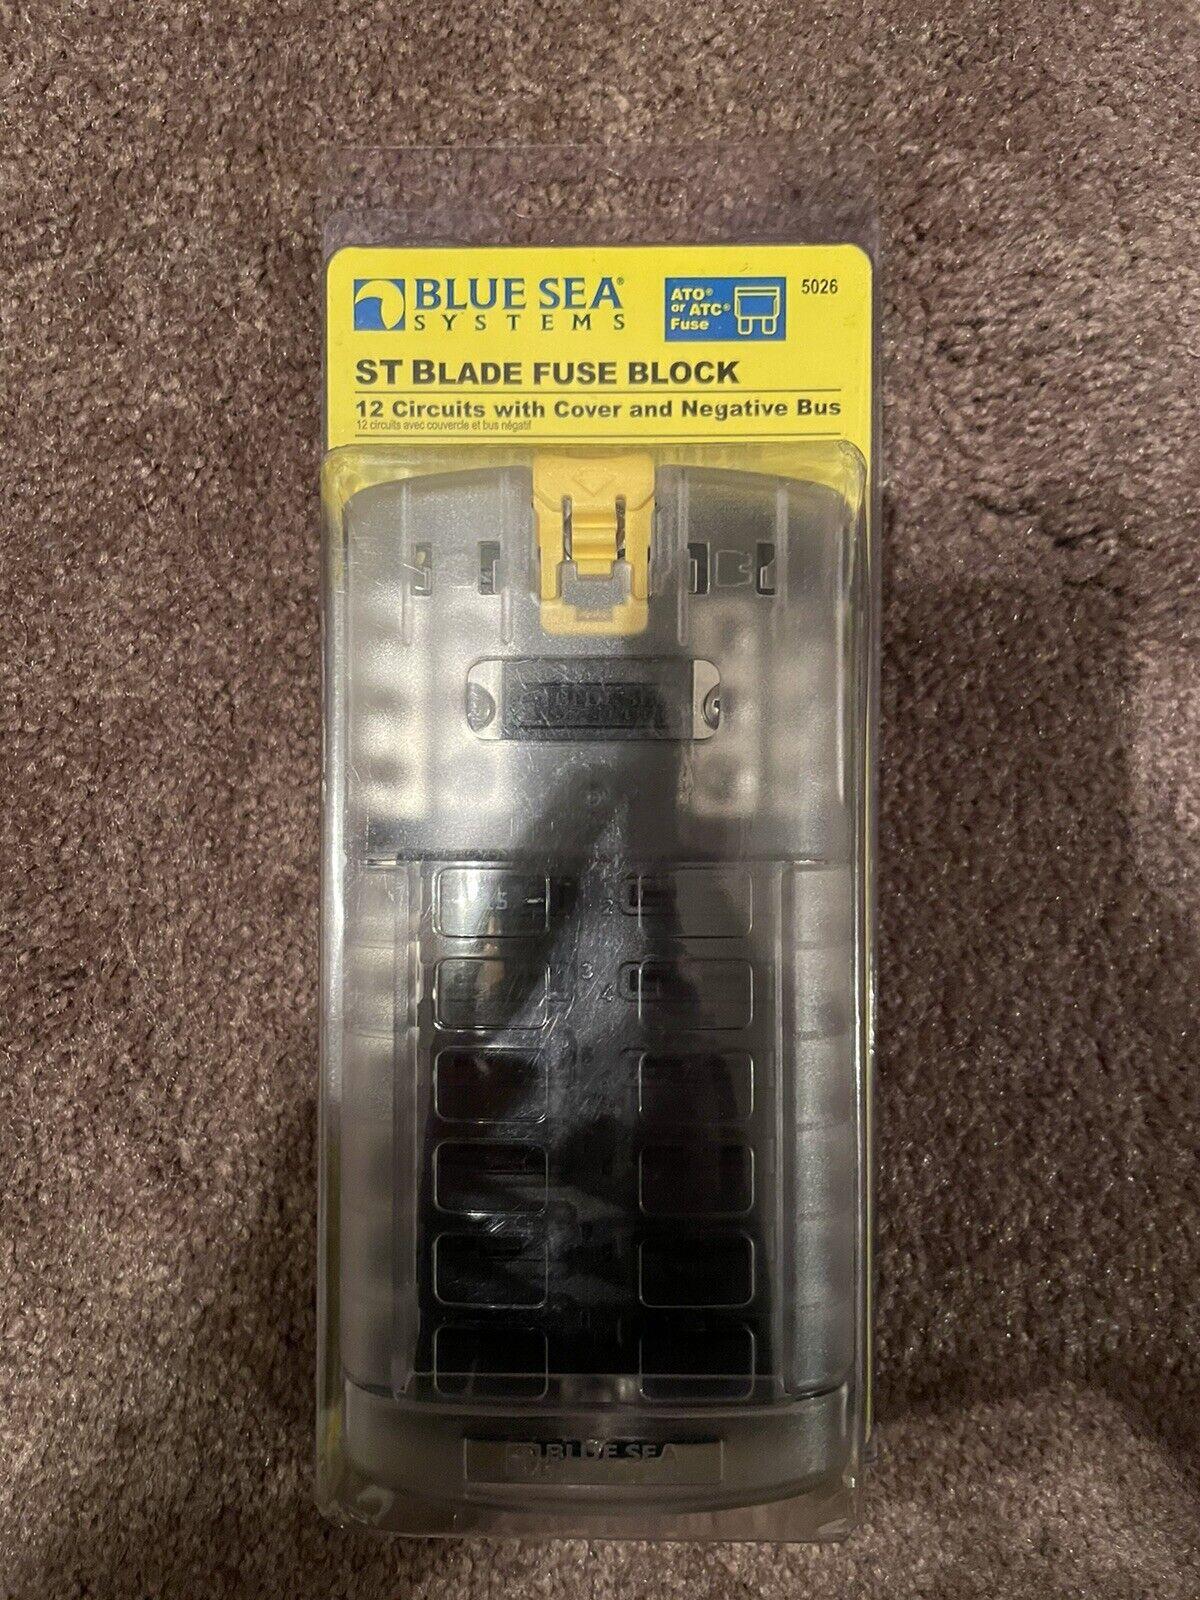 6 Circuit AMRB-5028 Blue Sea ST Blade Fuse Block w//Cover